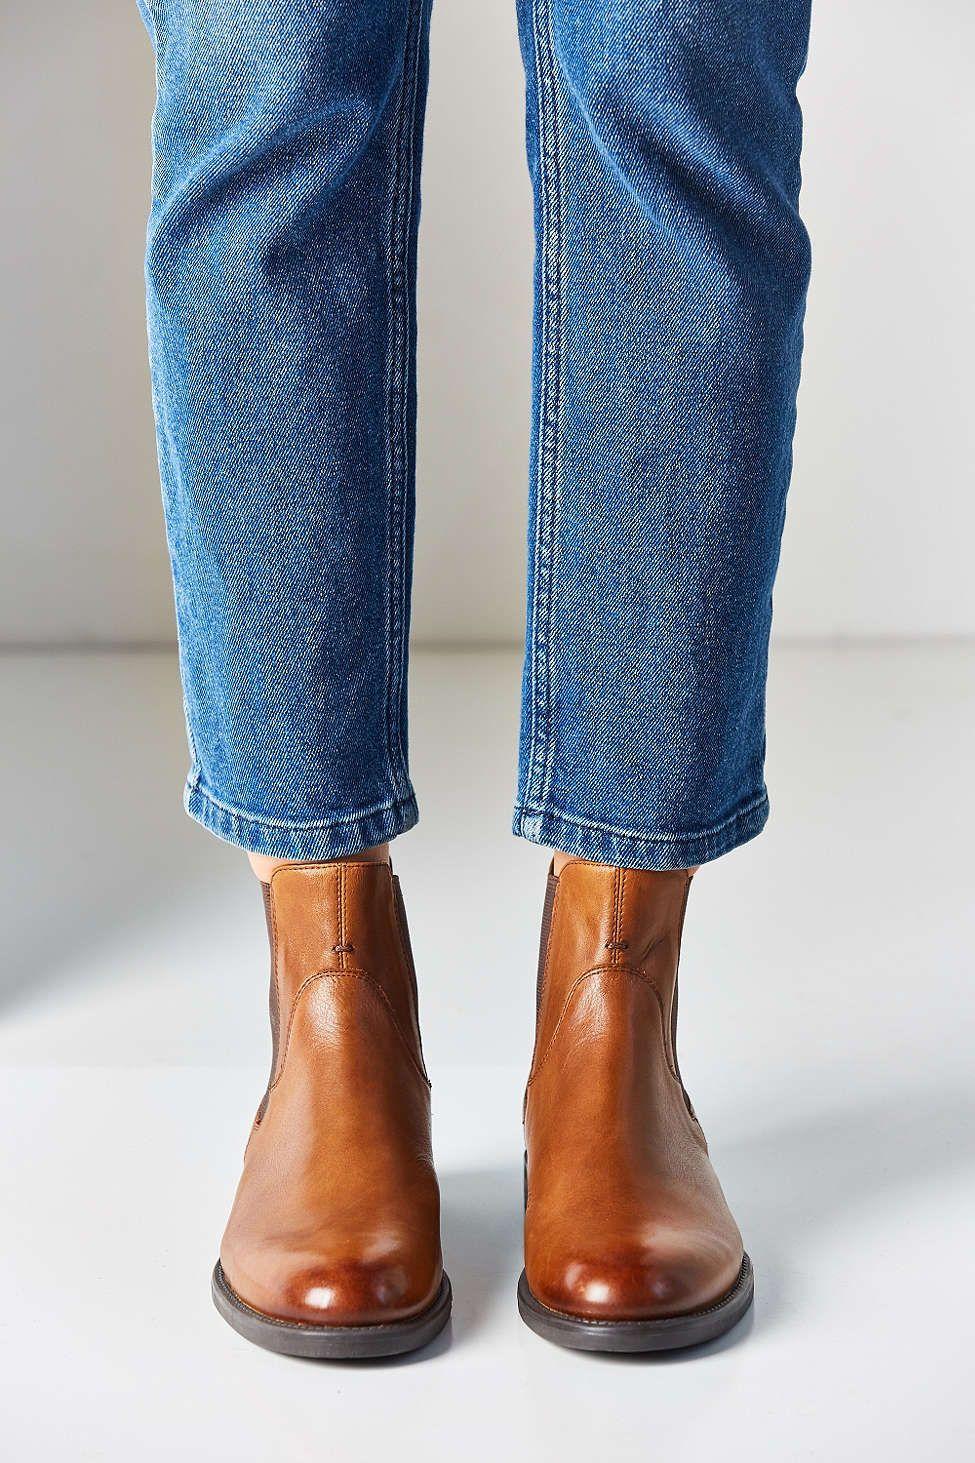 b1ef0e739fc Vagabond Amina Chelsea Boot | s h o e s | Boots, Chelsea boots, Shoes